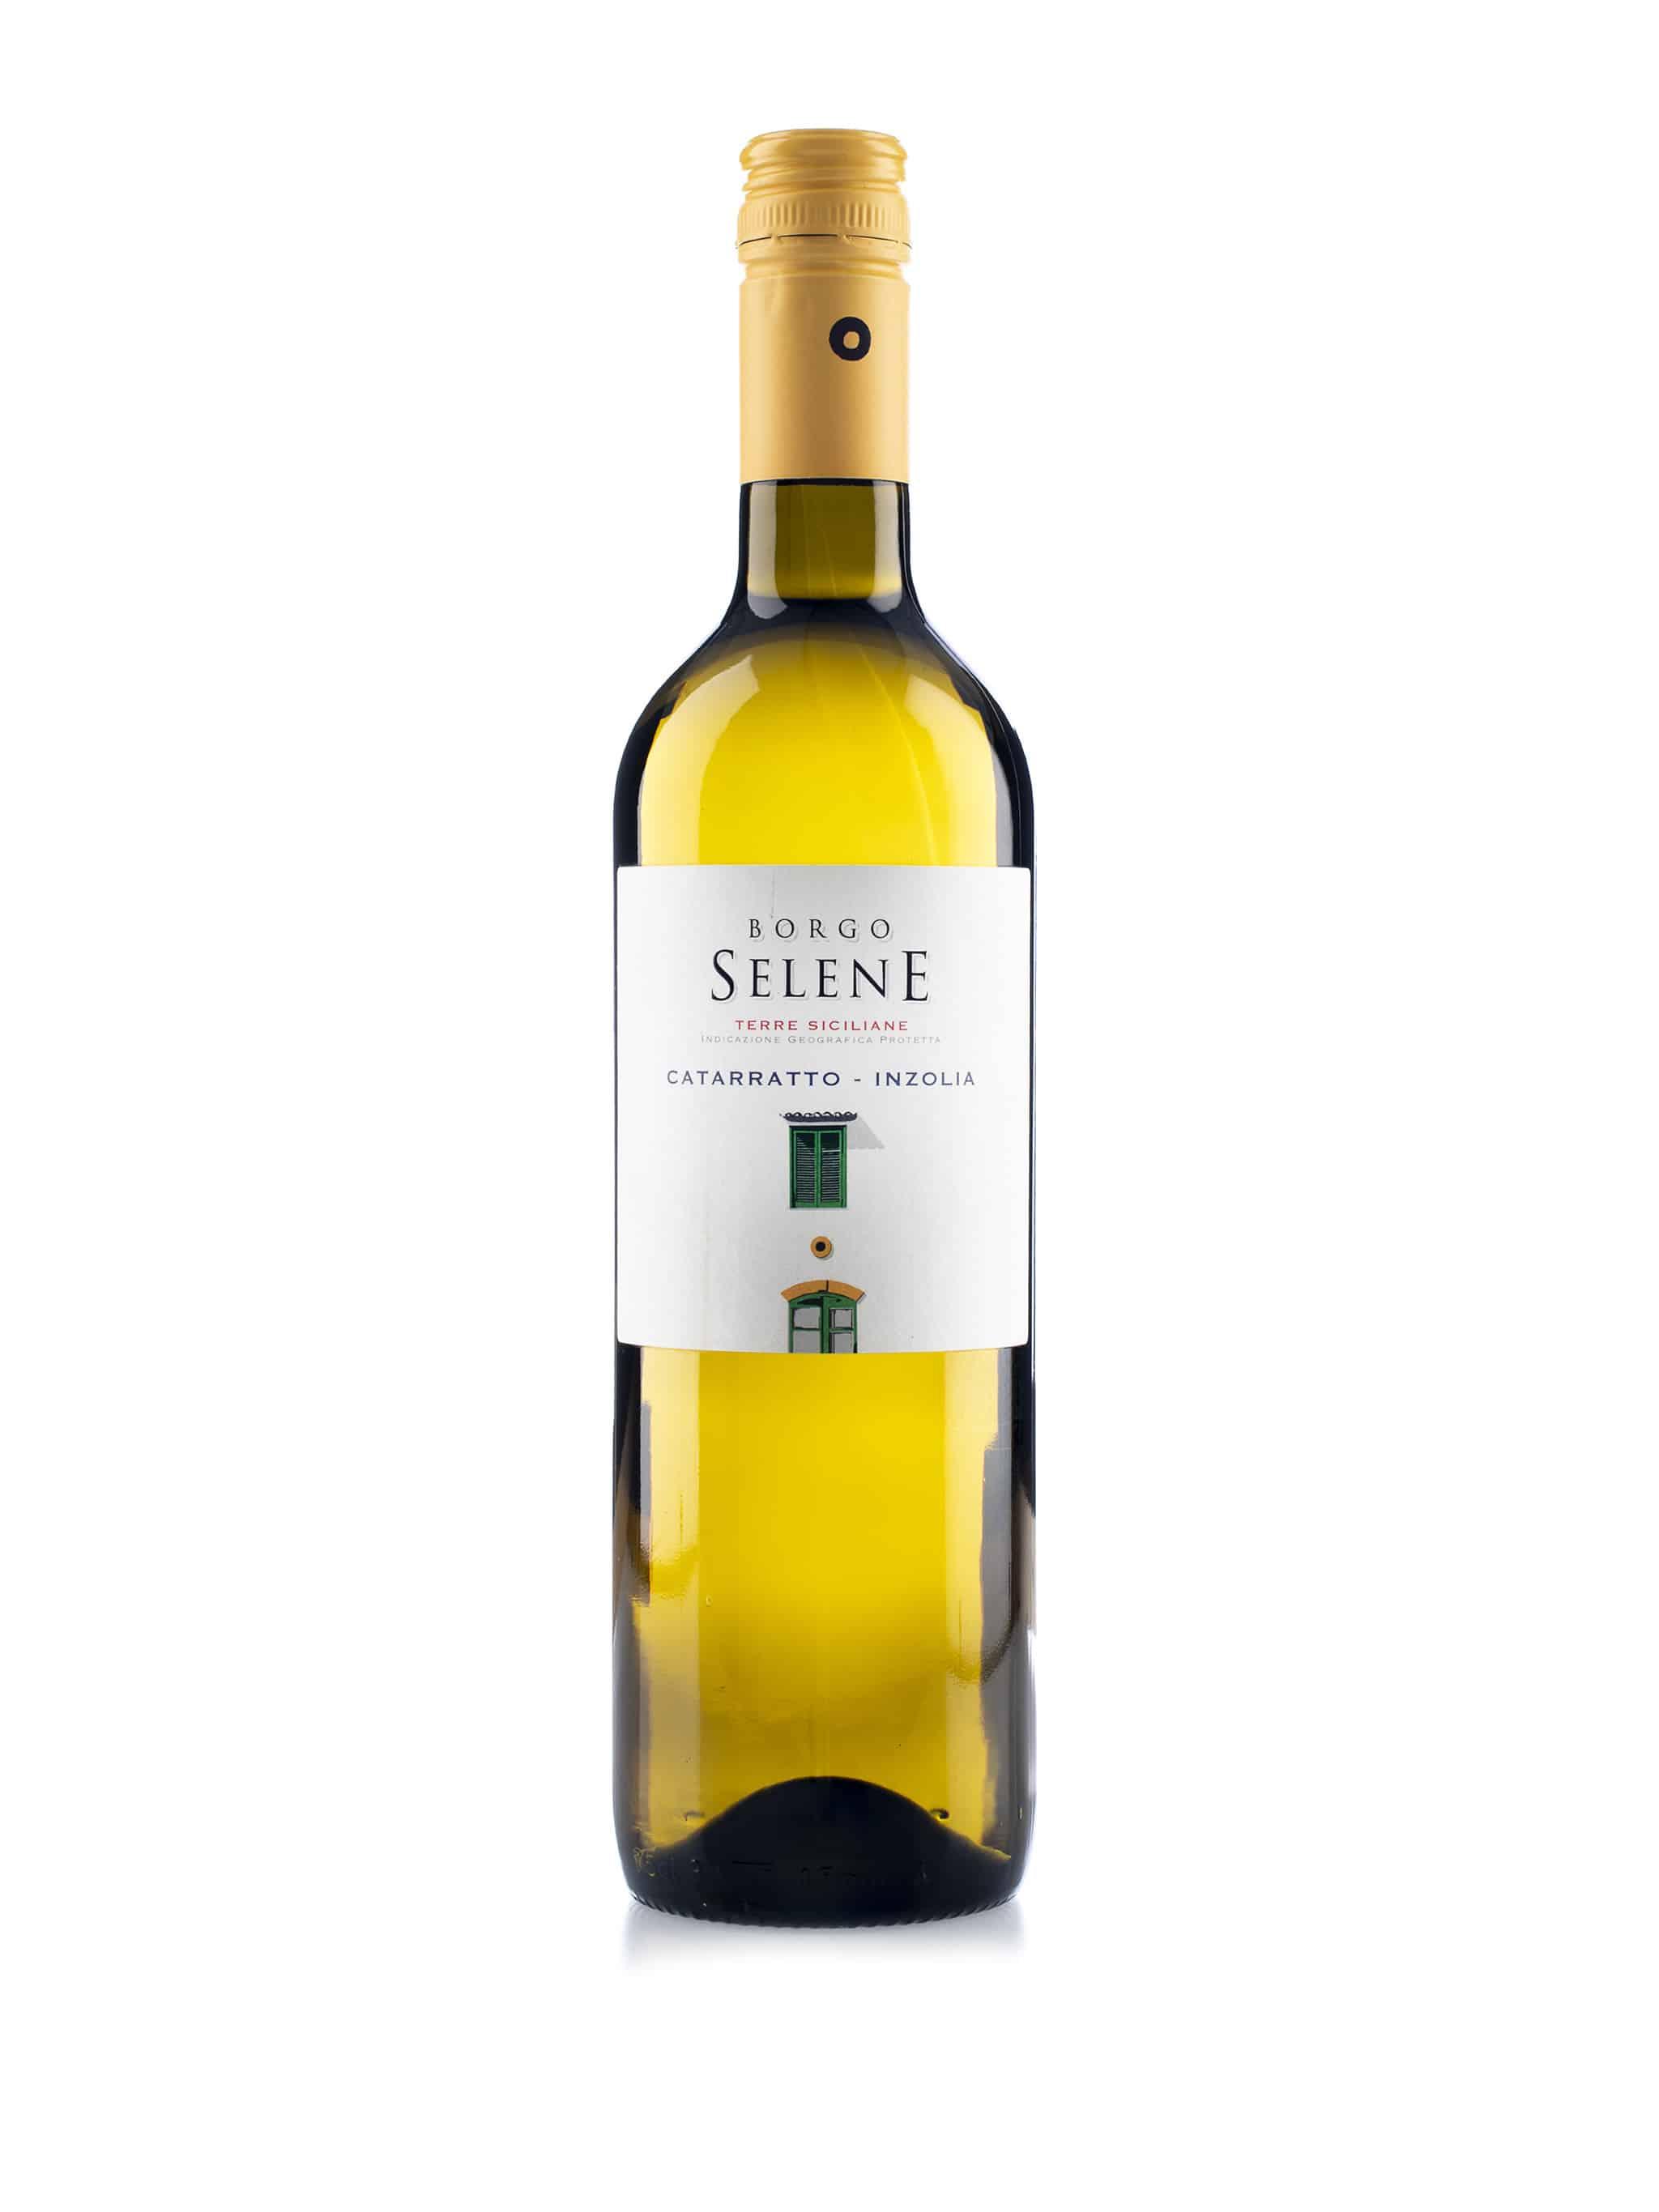 Italiaanse witte wijn van wijndomein Borgo Selene: Bianco Borgo Selene